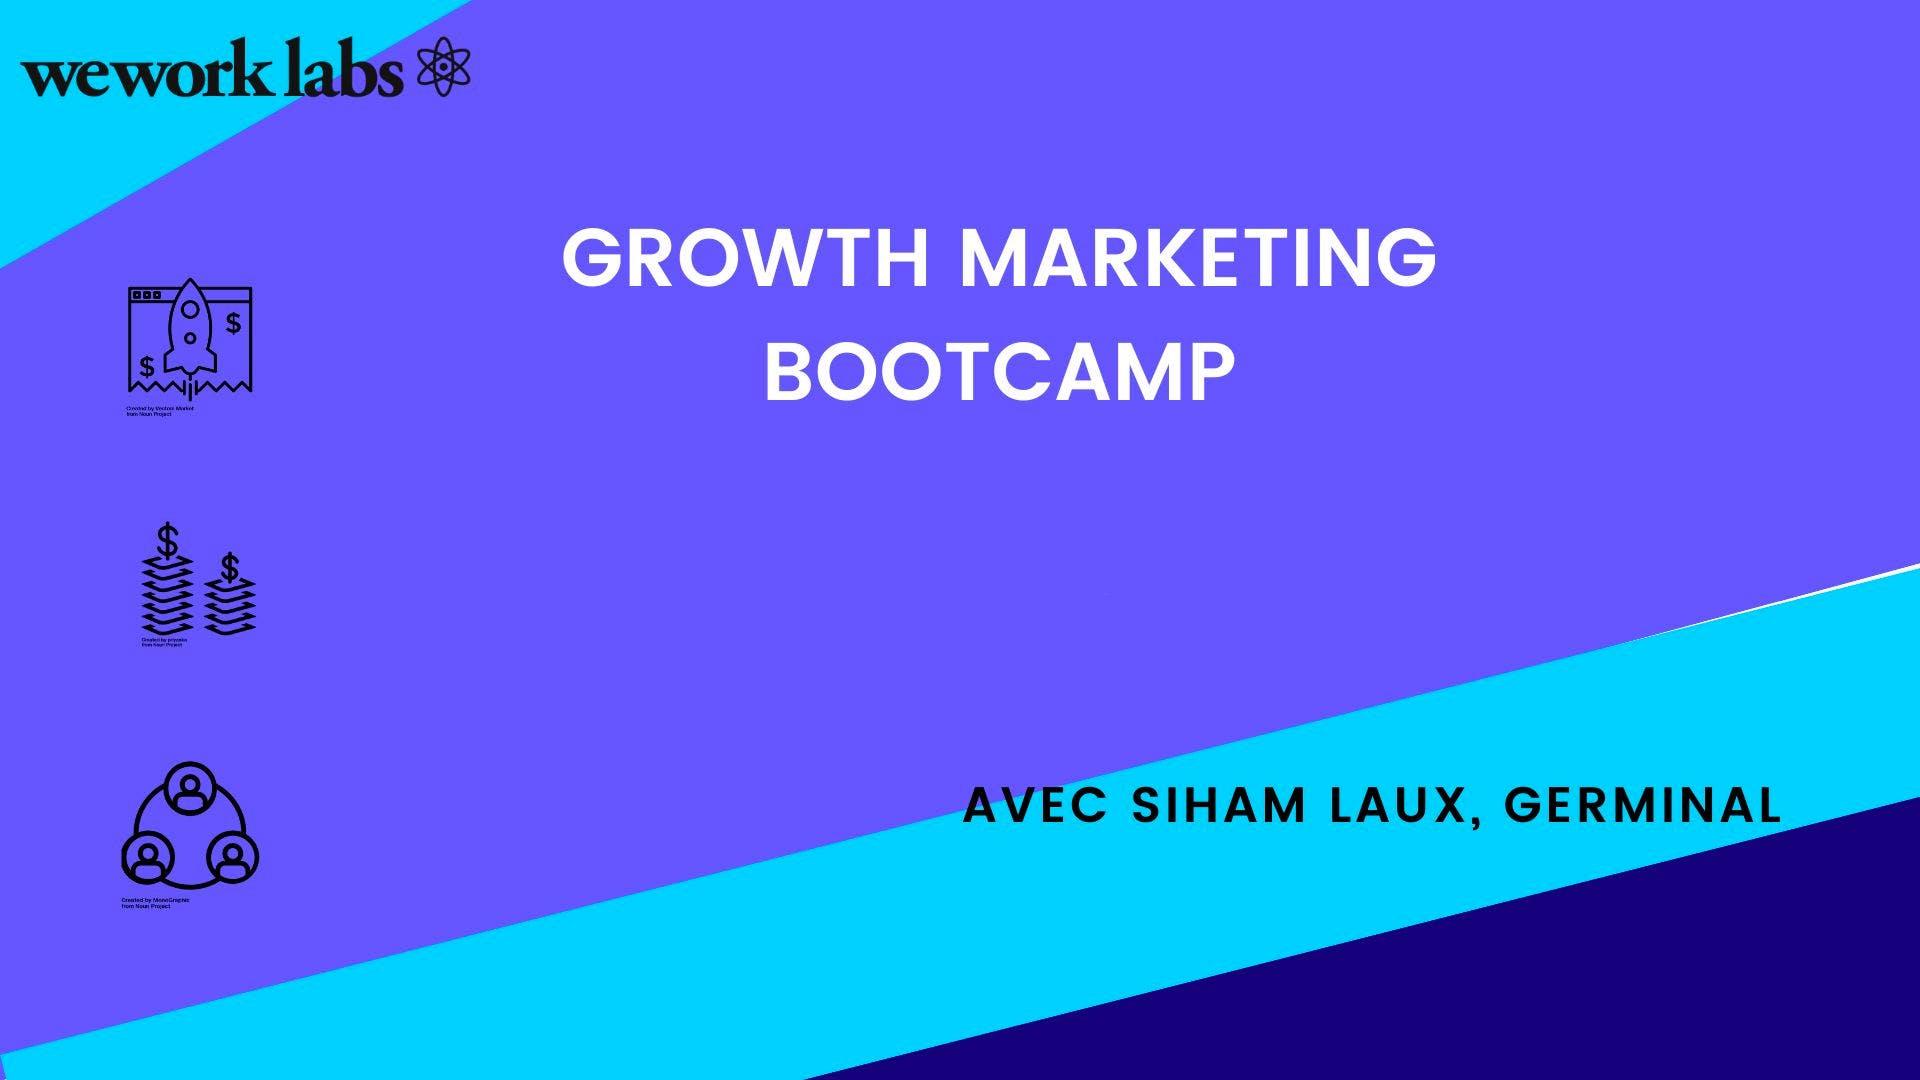 Growth Marketing Bootcamp - Structurer, Organiser & Documenter son Projet (3/5)